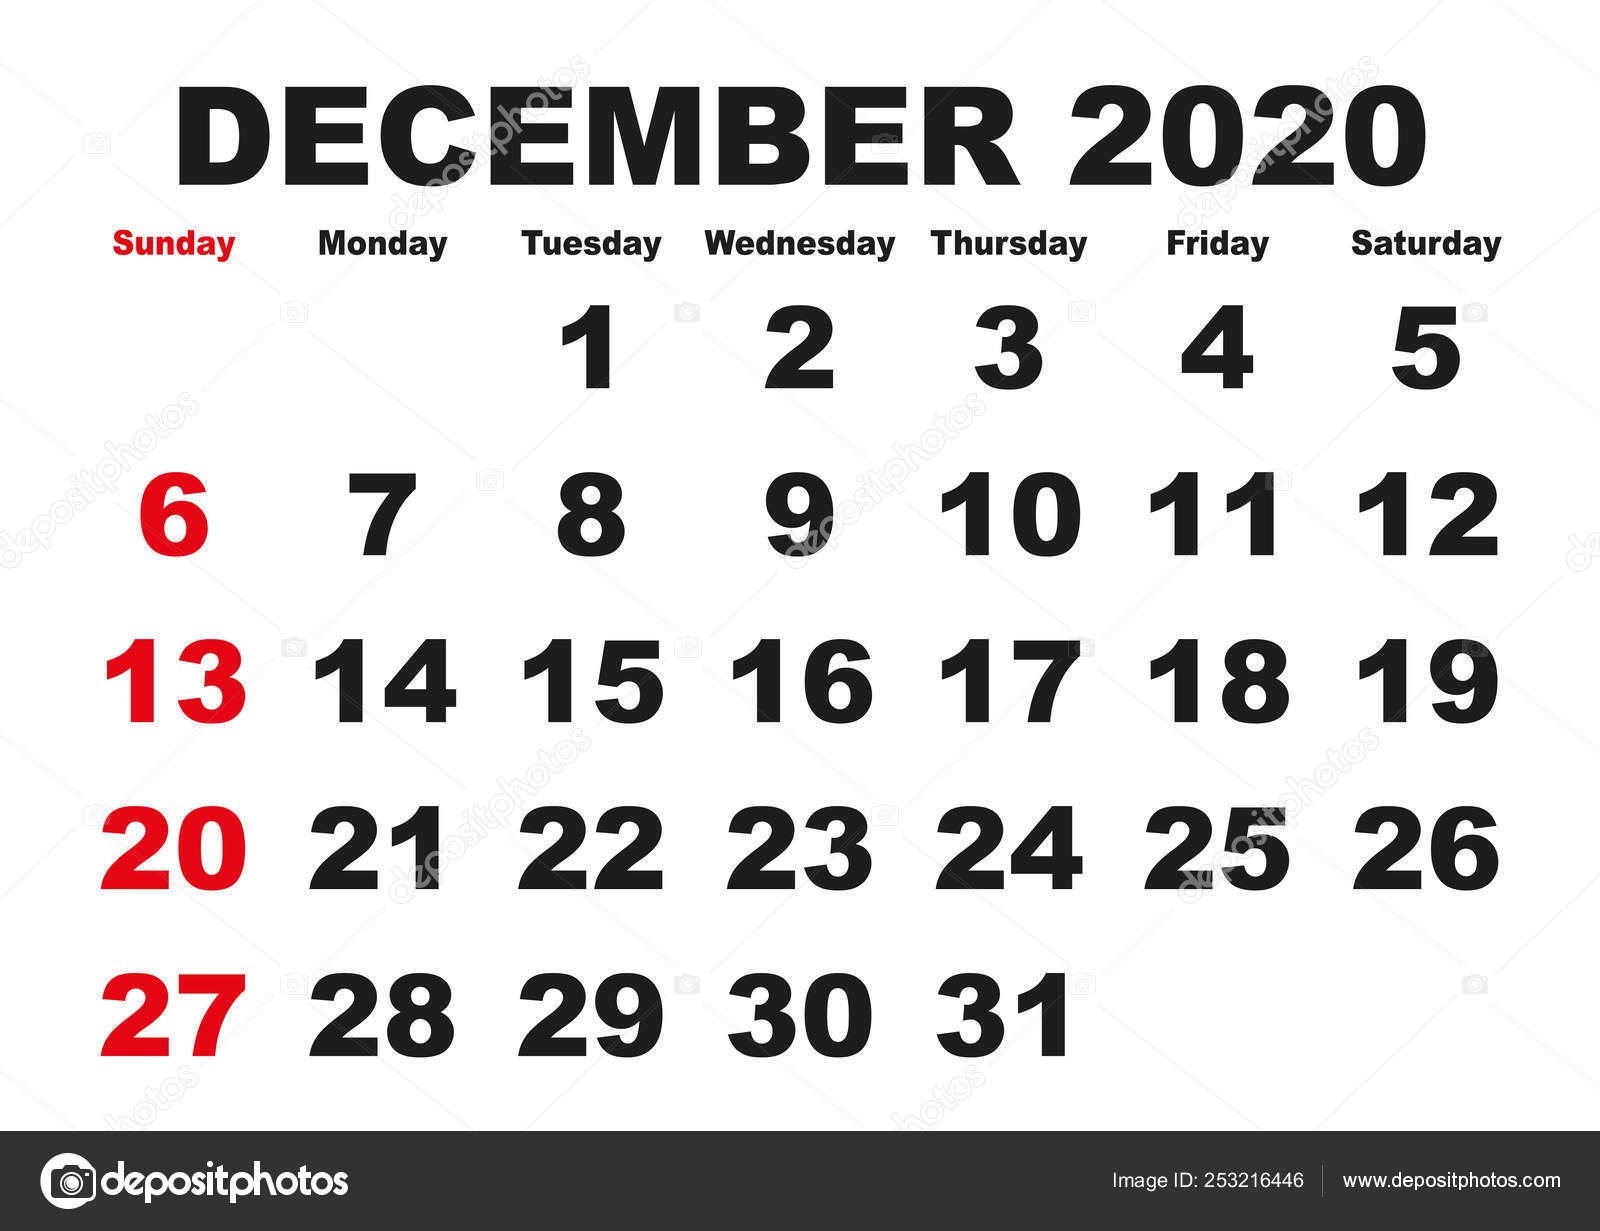 Calendario Trimestrale 2020.Calendario Mensile Dicembre 2020 Inglese Usa Vettoriali